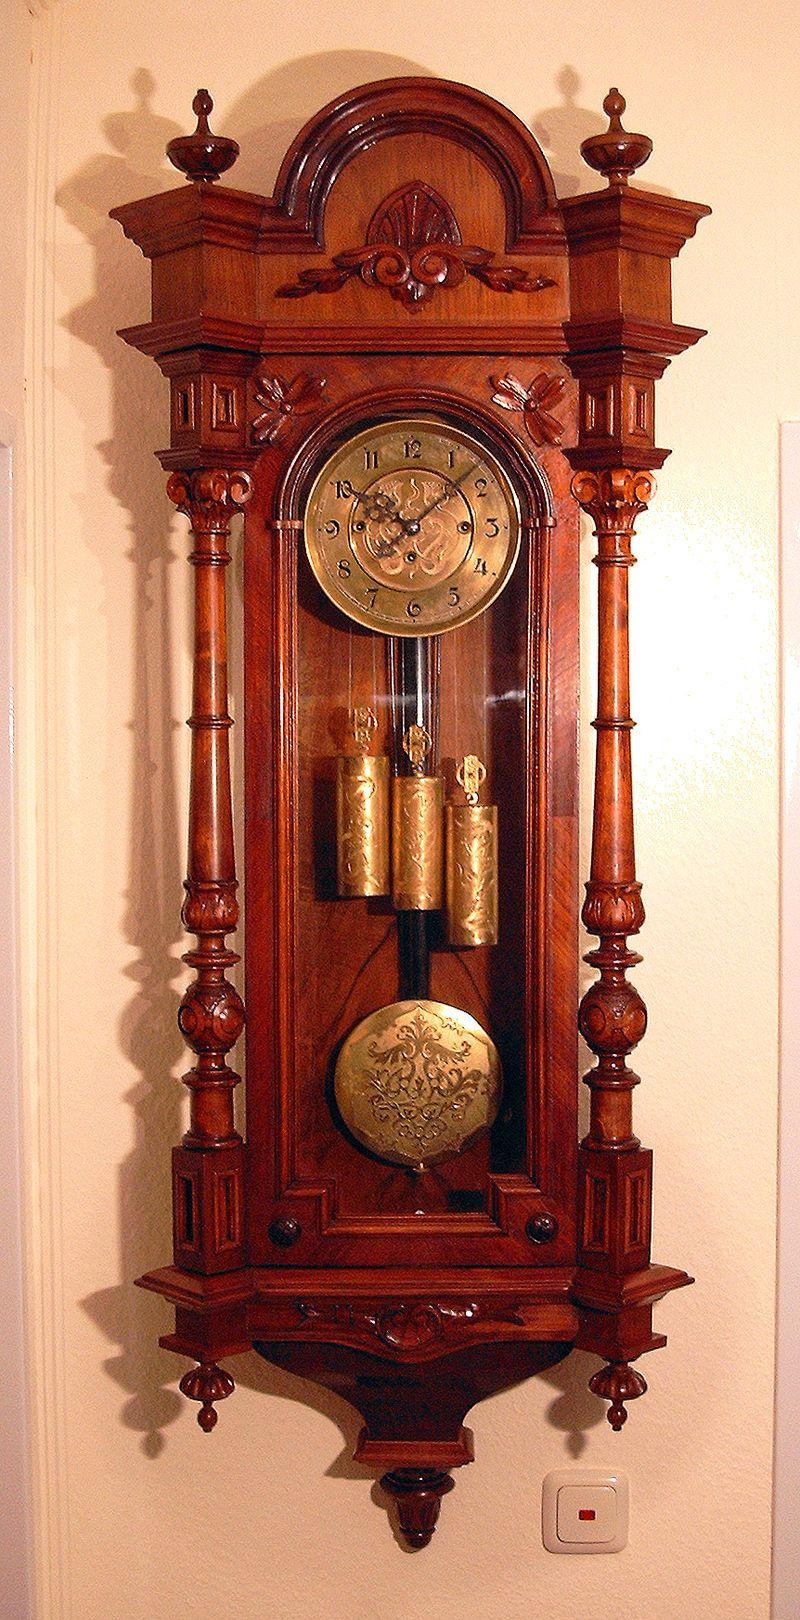 GB-3-Gew-Pendeluhr (Luekk) - Pendulum clock - Wikipedia | Antique ...